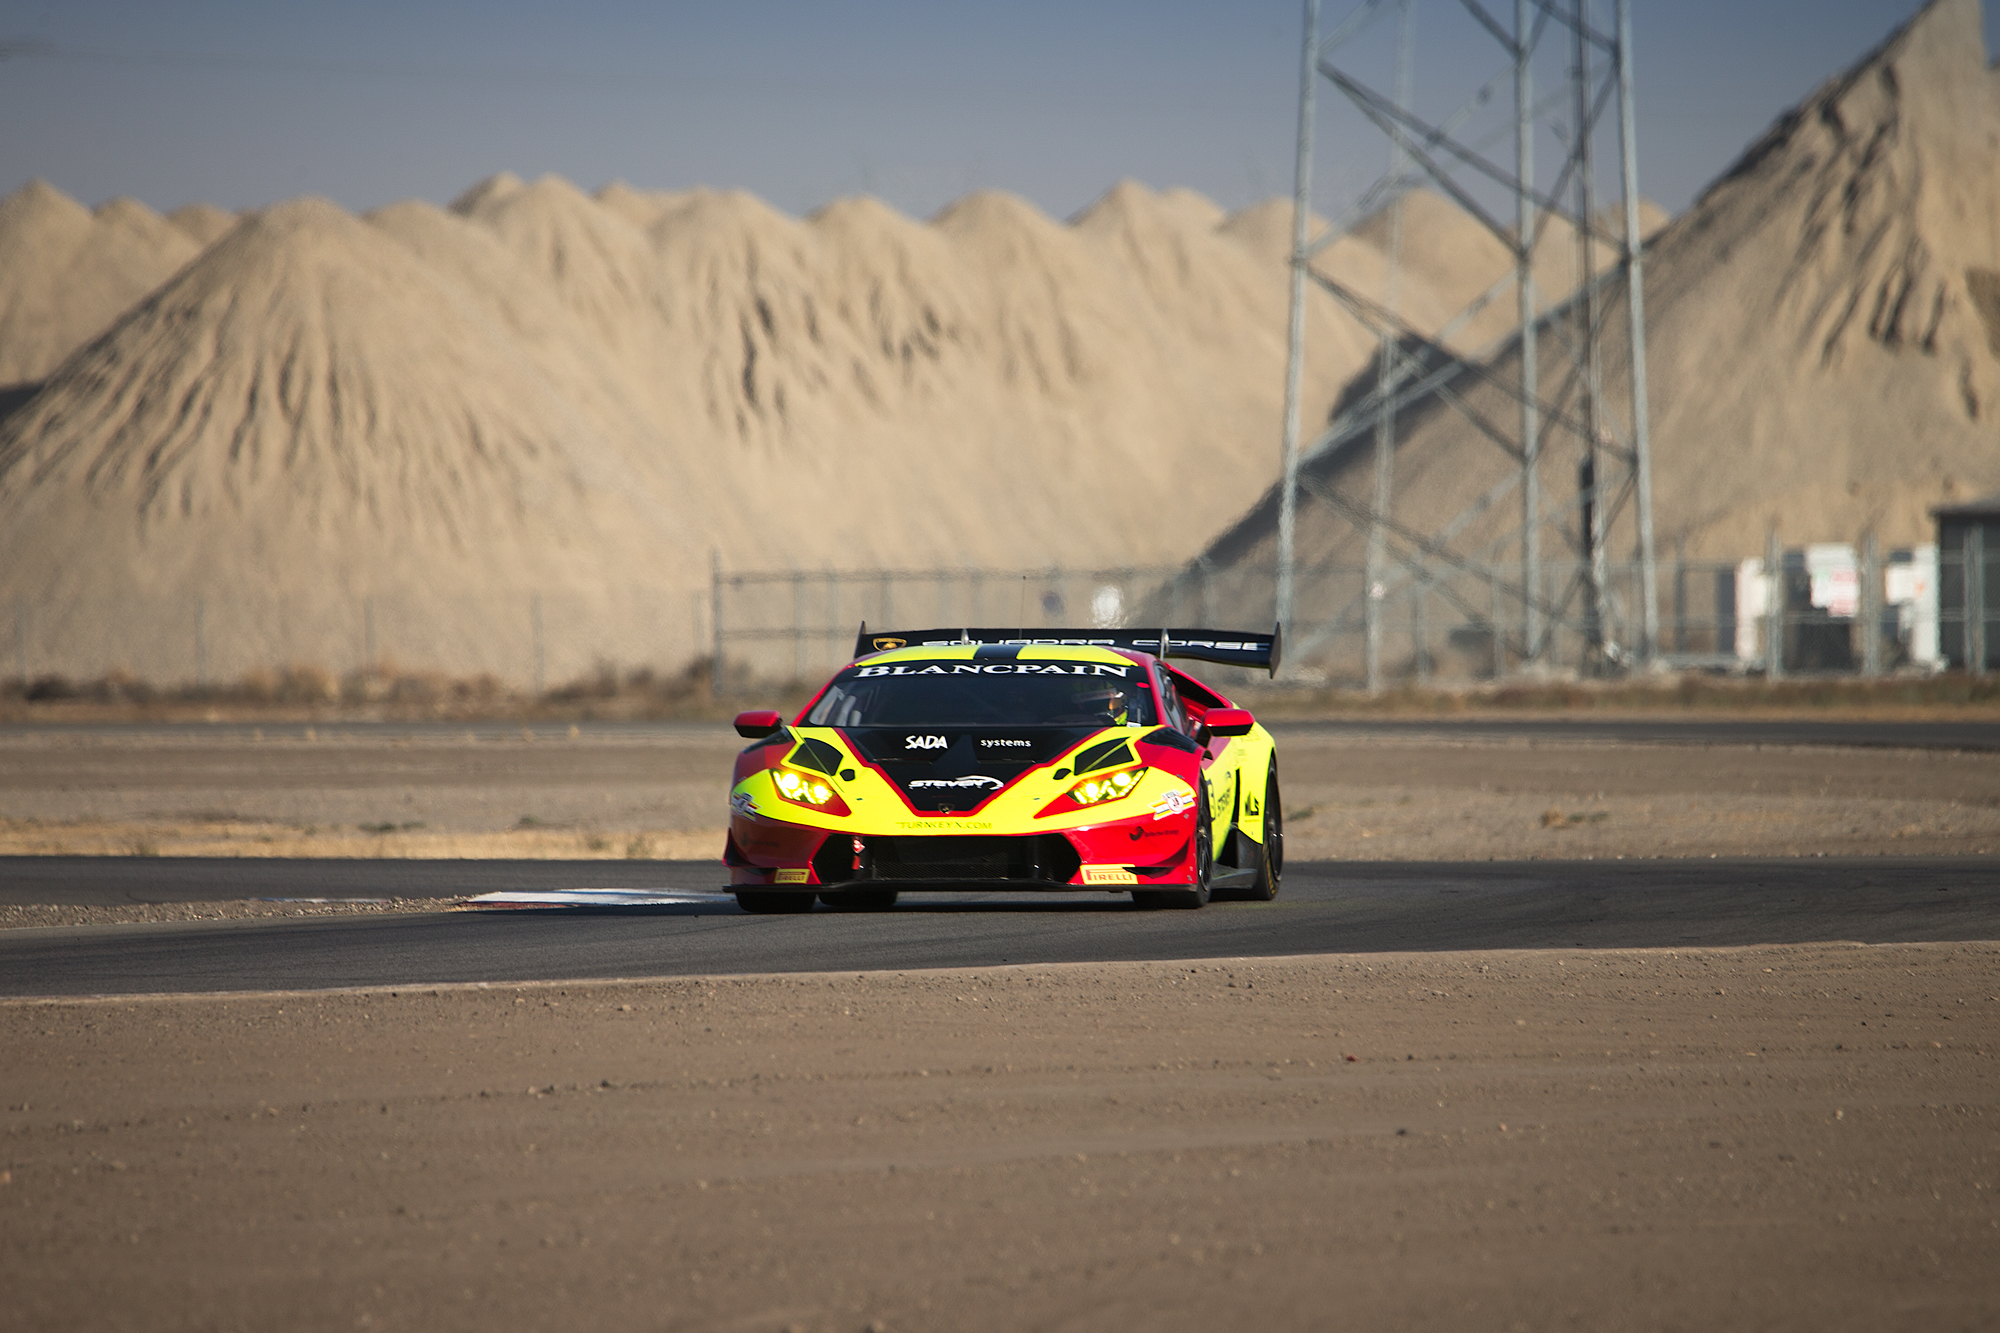 Steven-Racing-20171027-53493.jpg